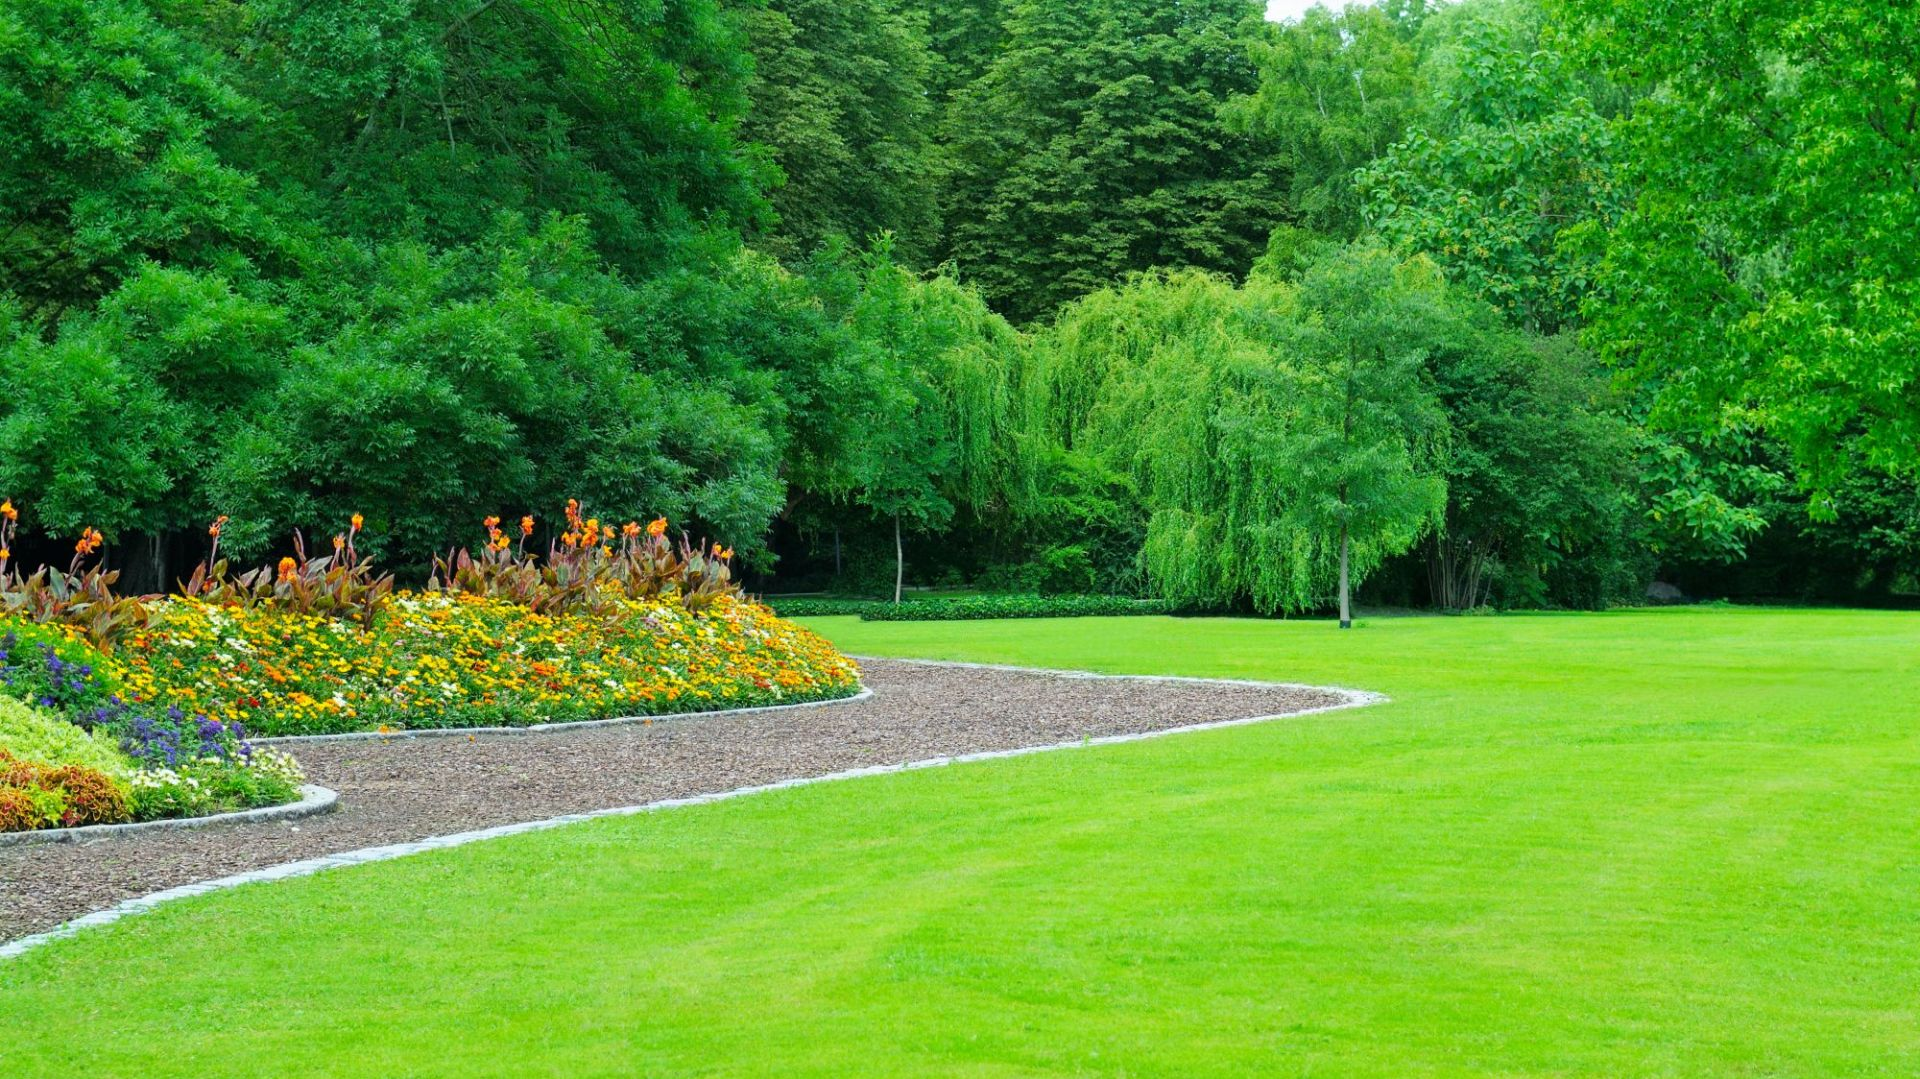 Projekt i pielęgnacja ogrodu. Fot. Shutterstock